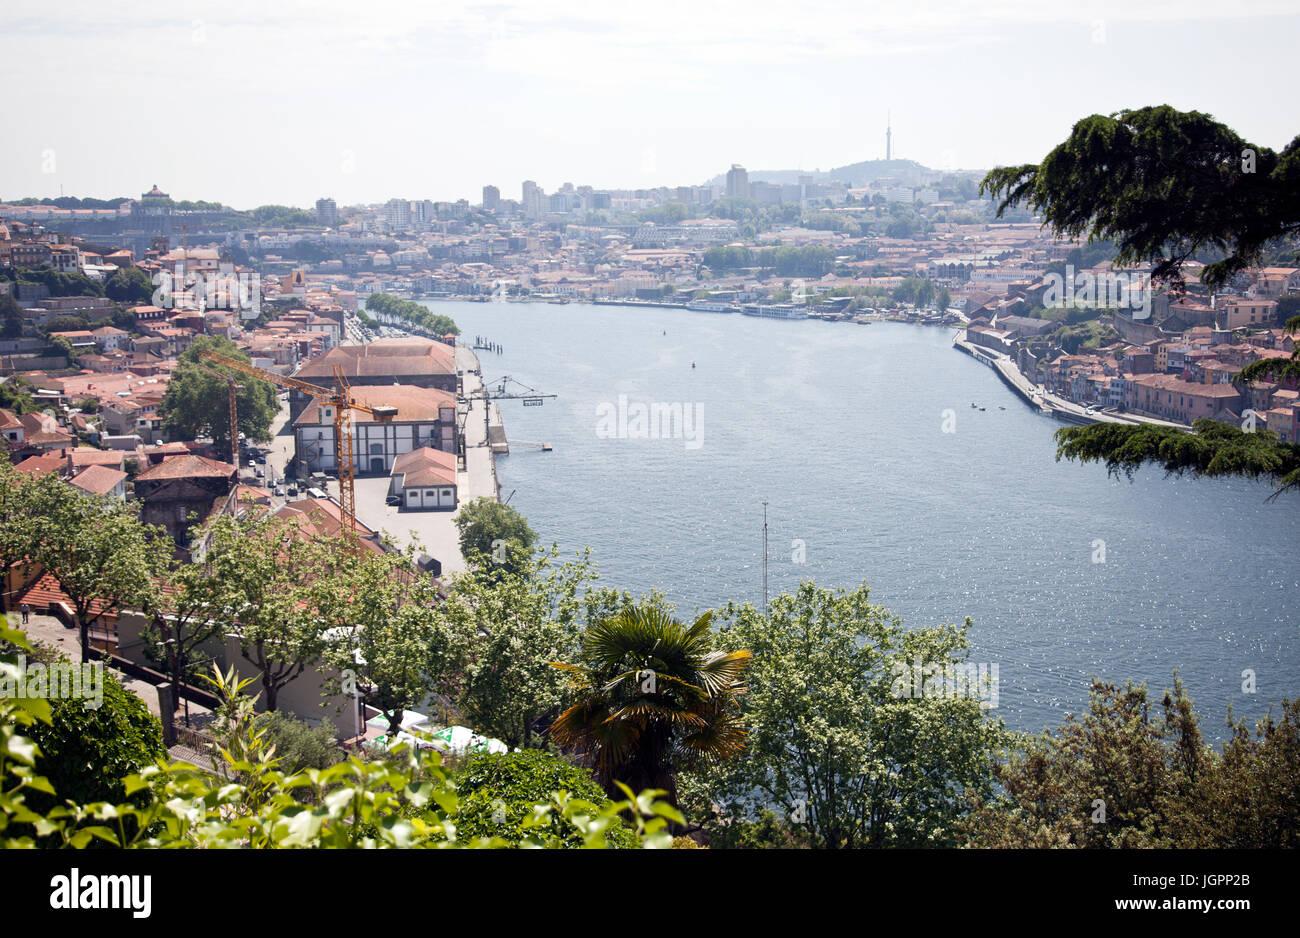 Views from Palacio de Cristal Gardens in Porto - Portugal - Stock Image